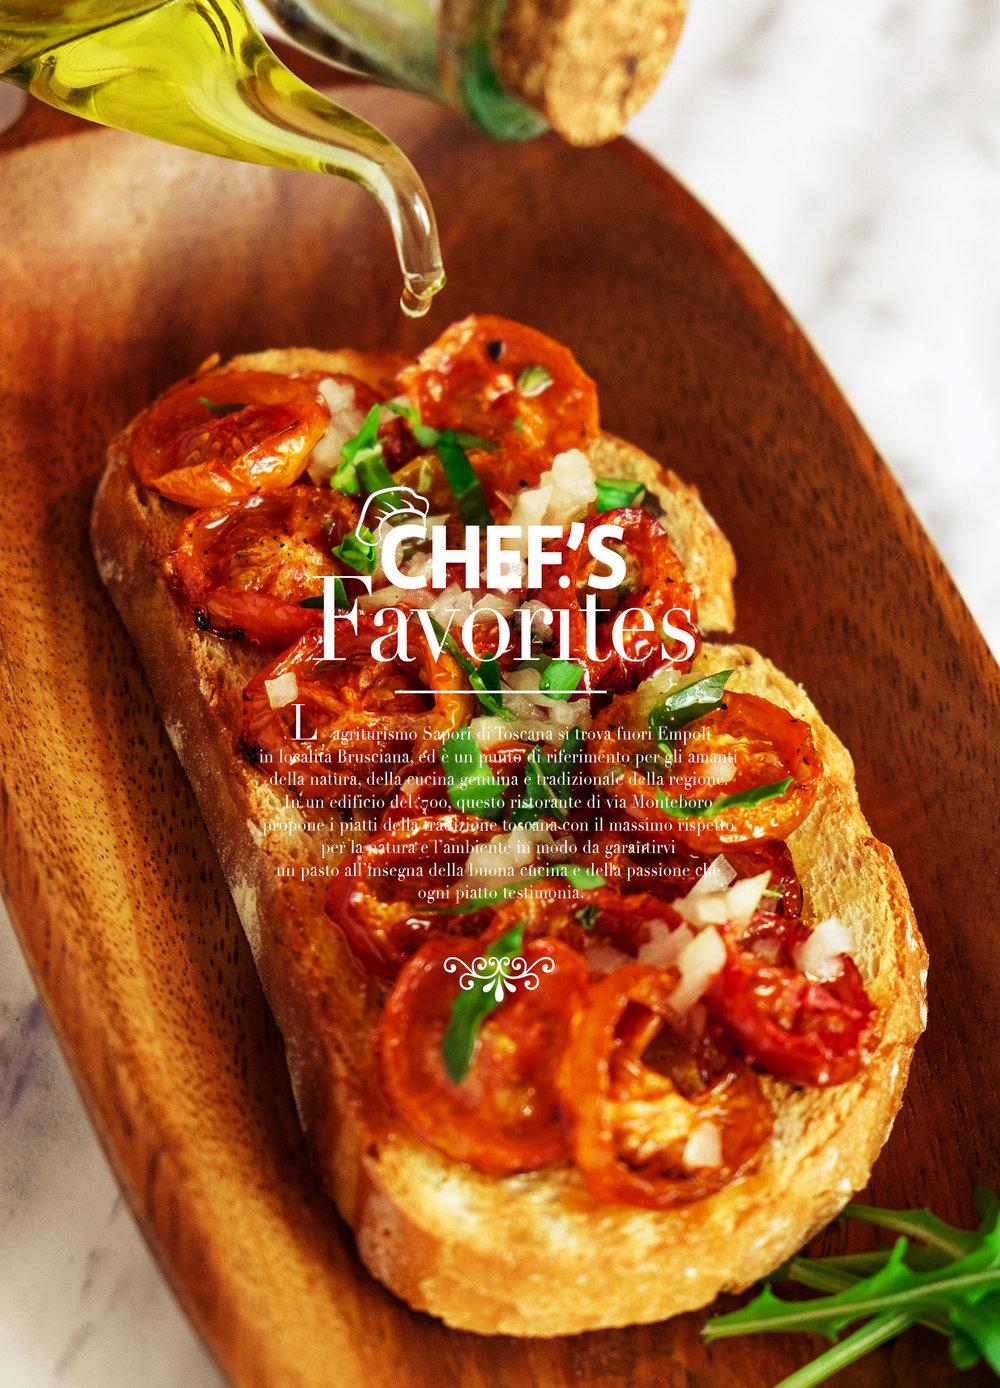 fotografo comida barcelona leandro crespi restaurante anuncio.jpg